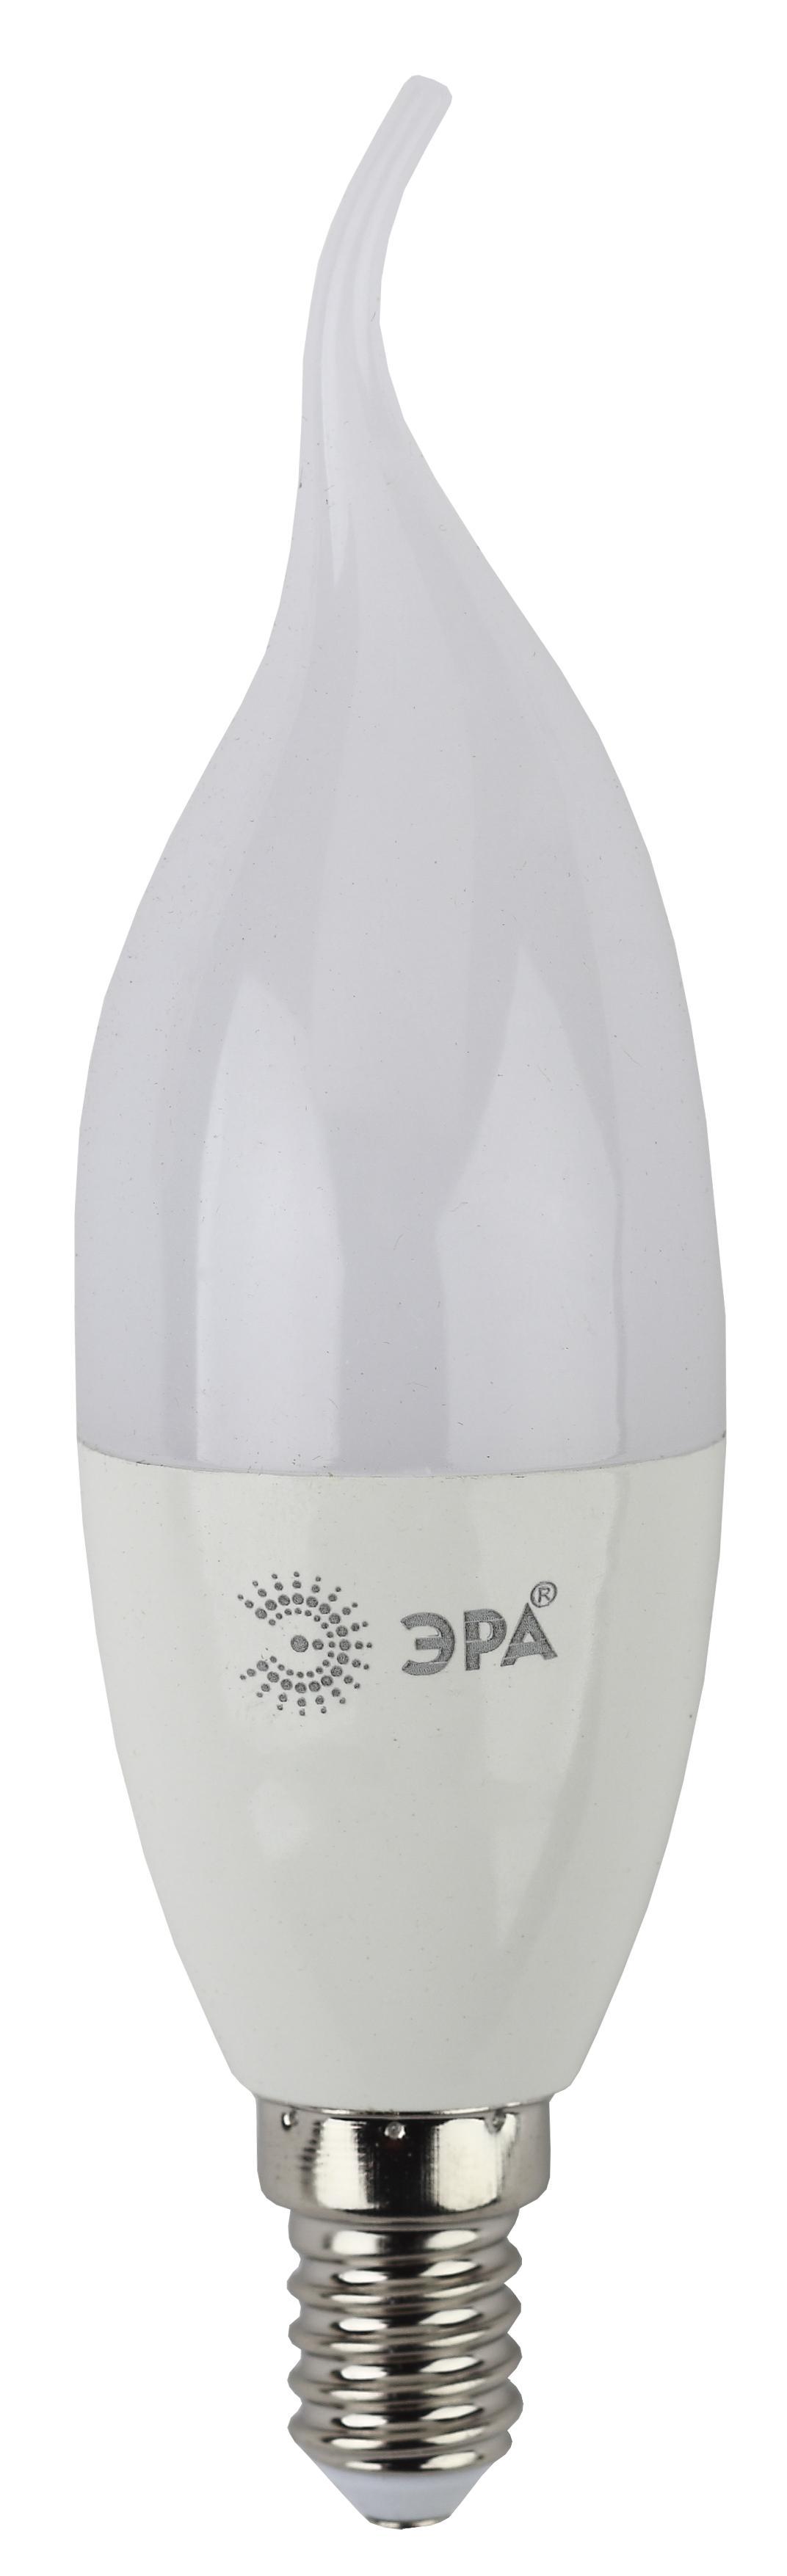 Лампа светодиодная ЭРА Led smd bxs-9w-827-e14